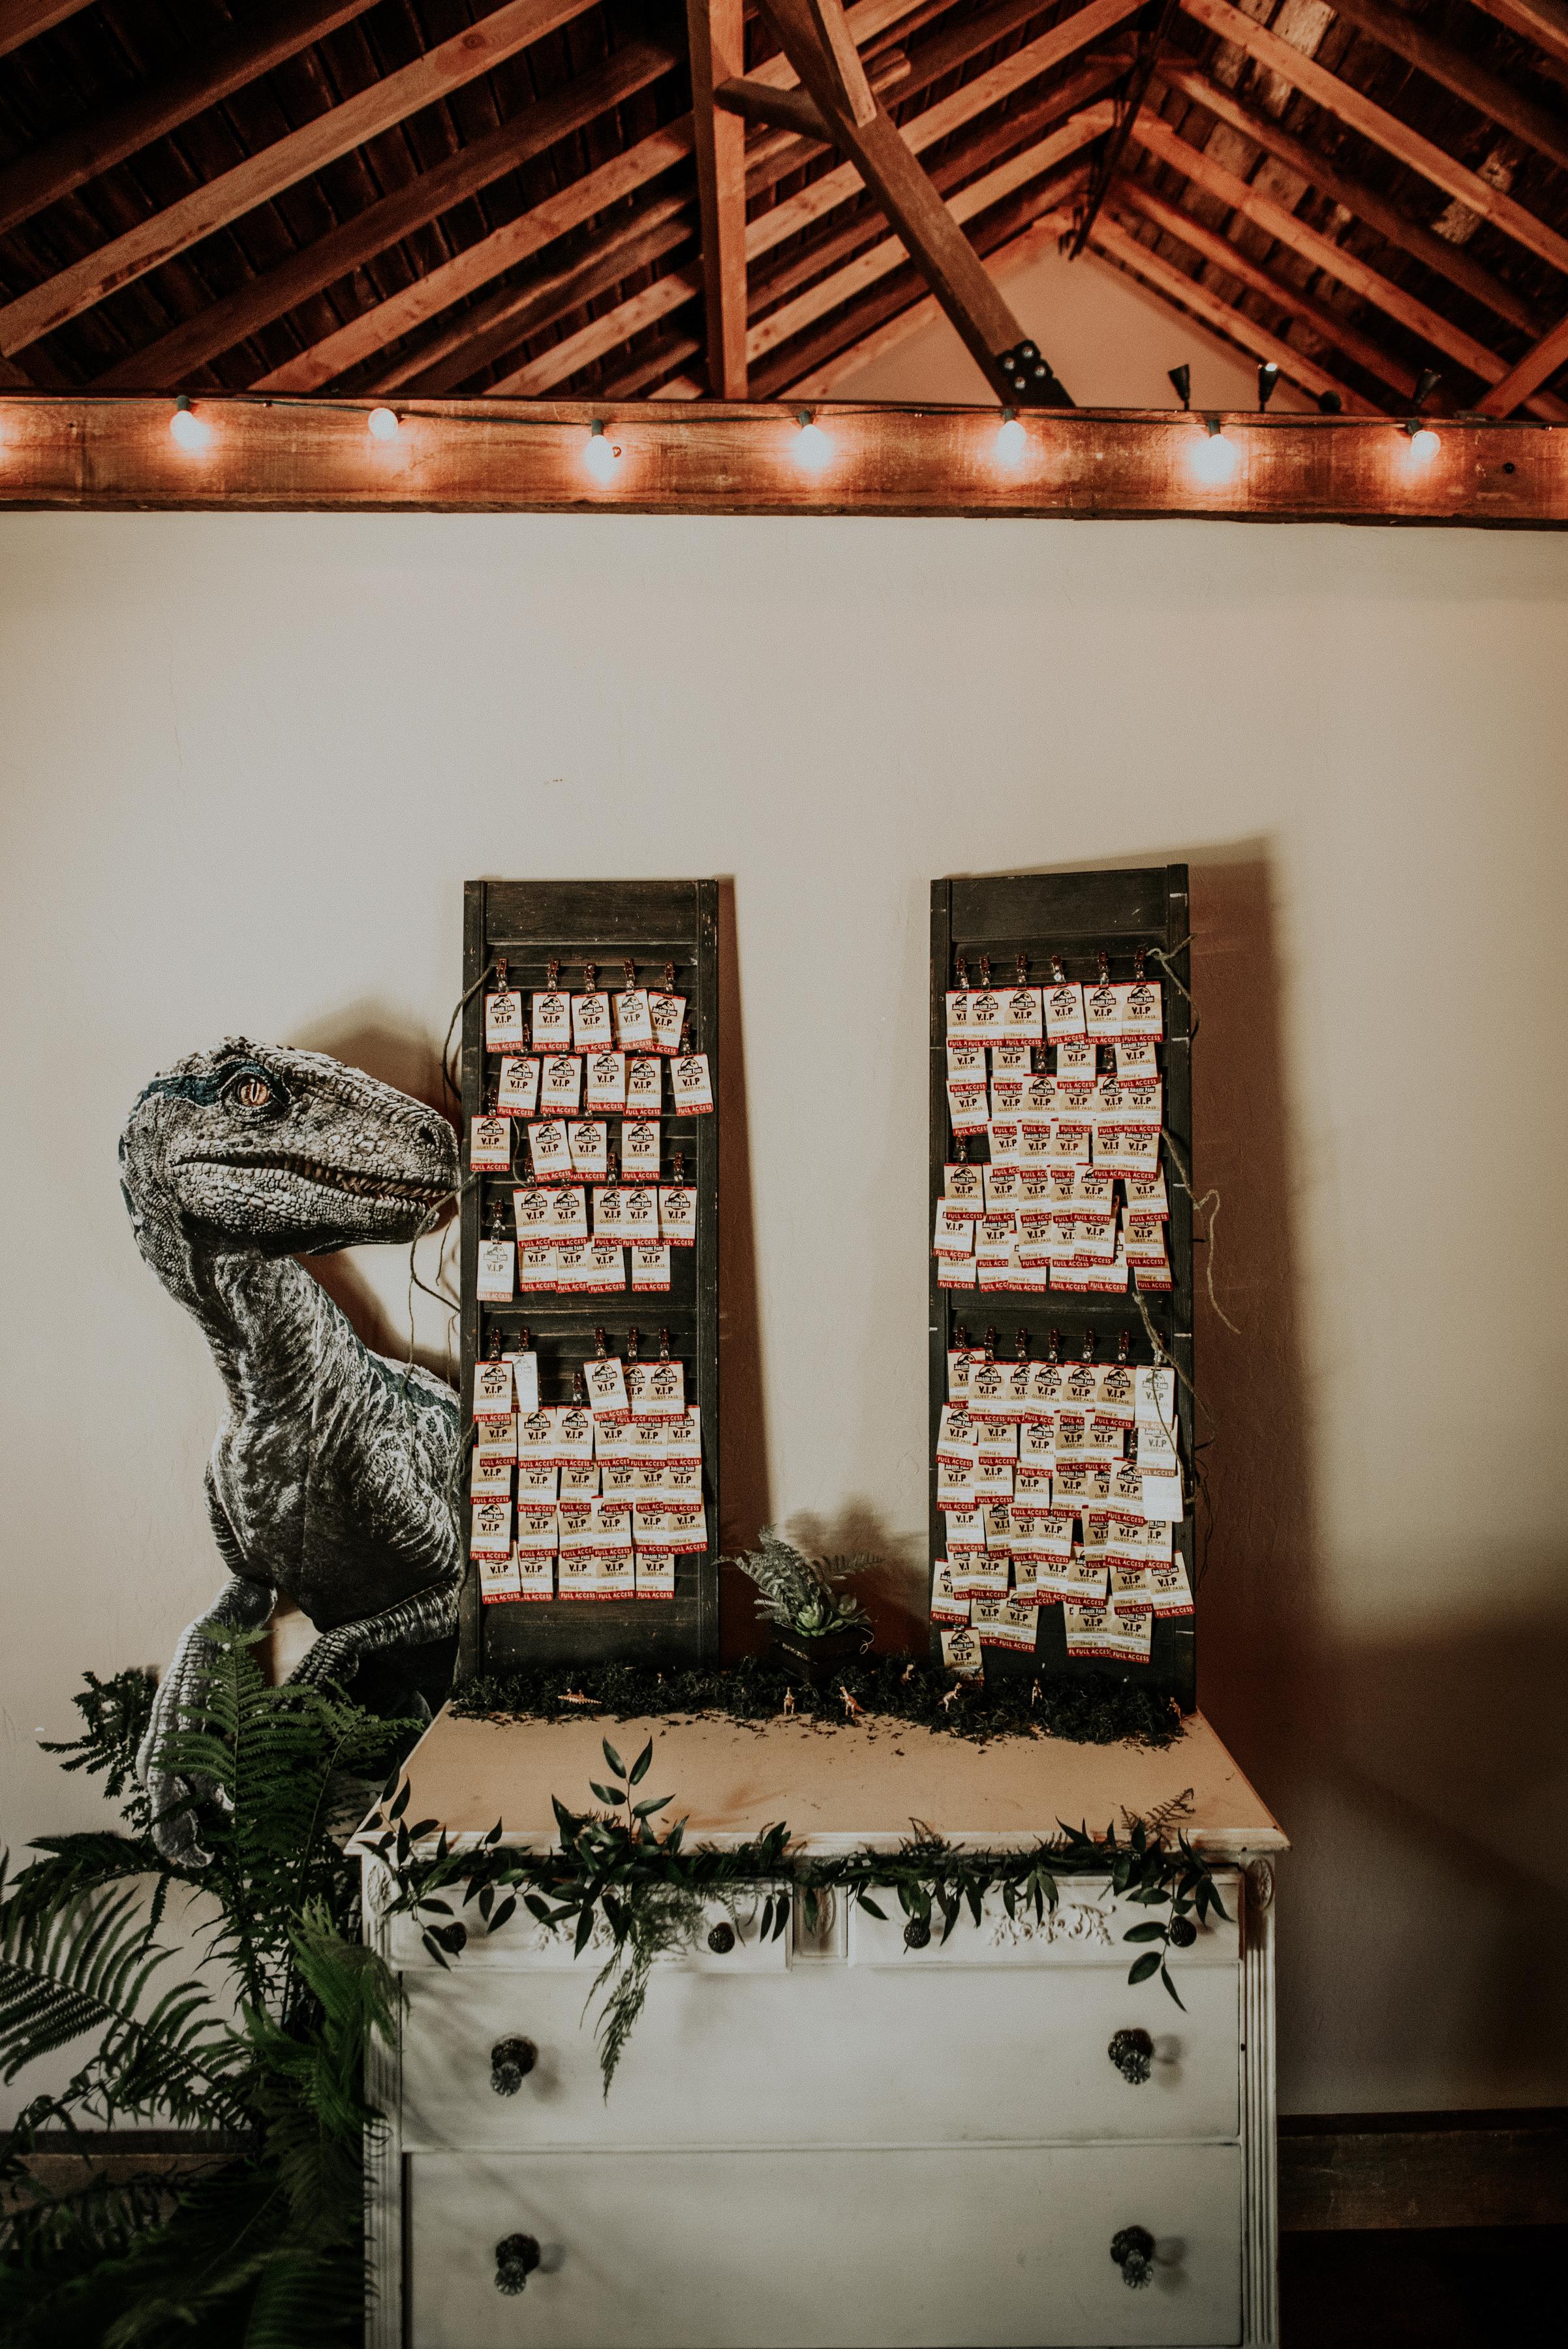 BridesbyYoung-RealWedding-PlusSizeBridal-BillyCourtney-JurassicParkTheme-17.jpg